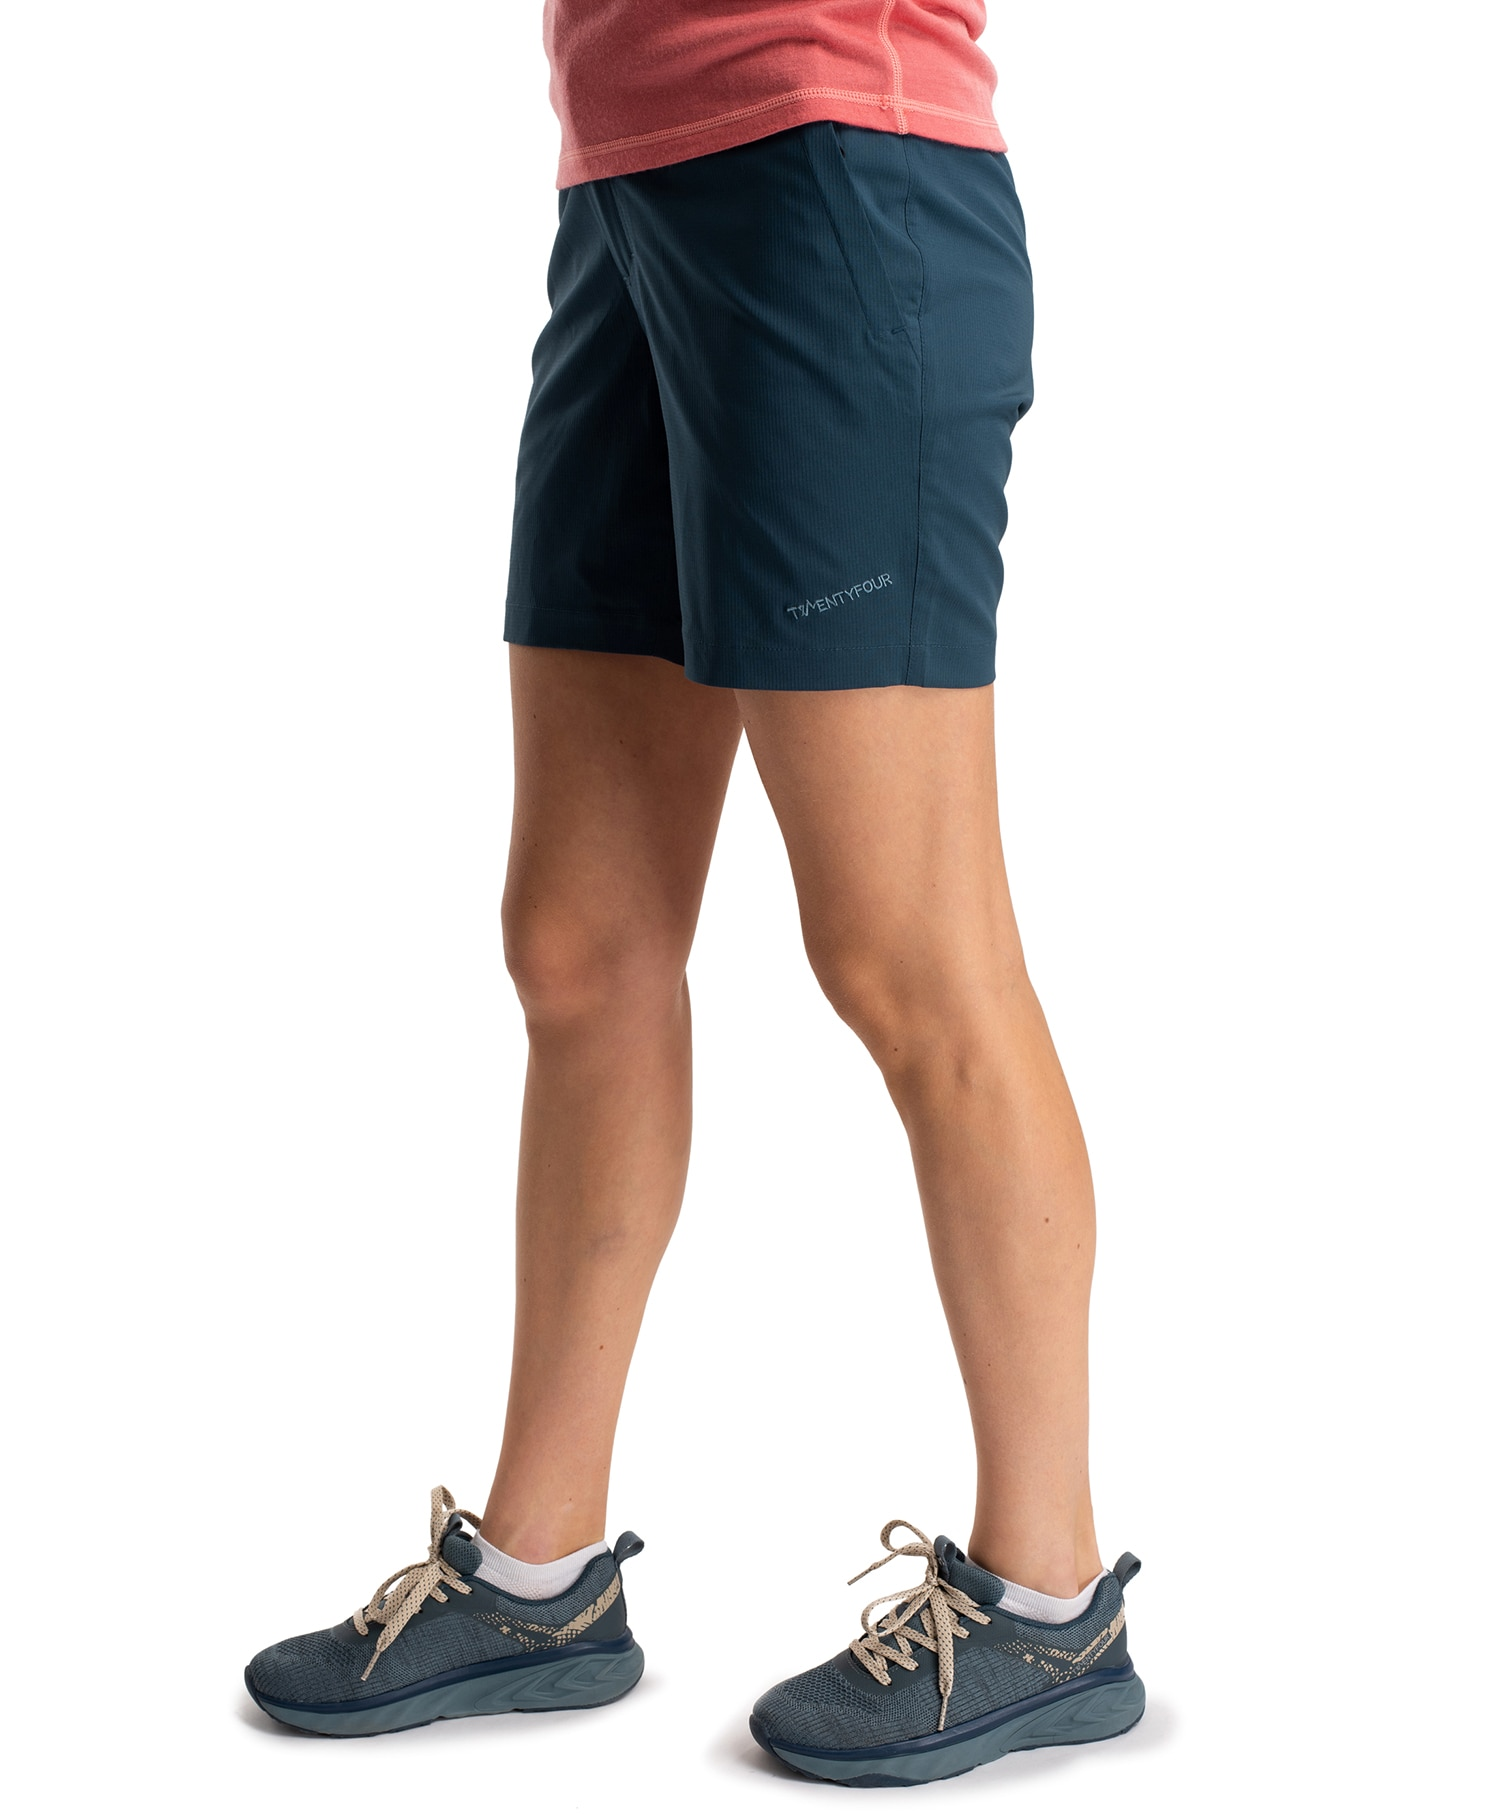 Twentyfour Dal LS Shorts